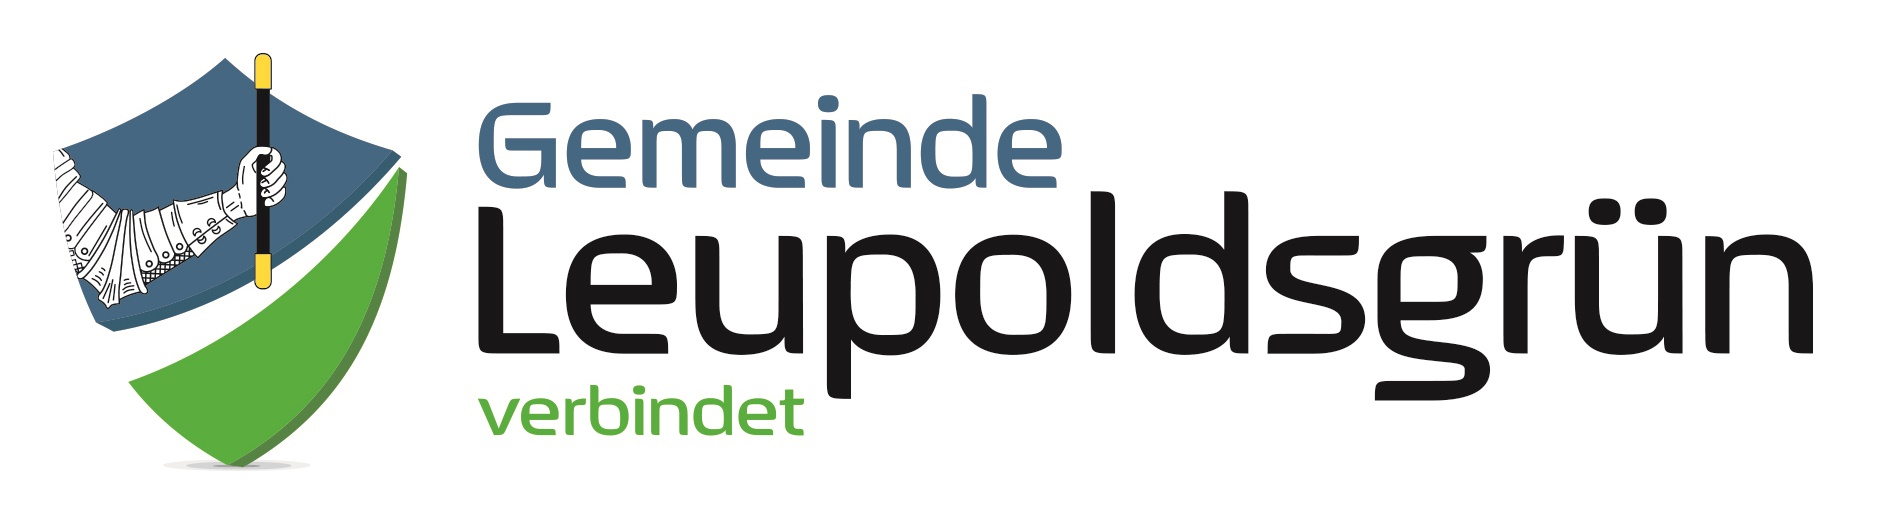 Gemeinde Leupoldsgrün - Kinderkino